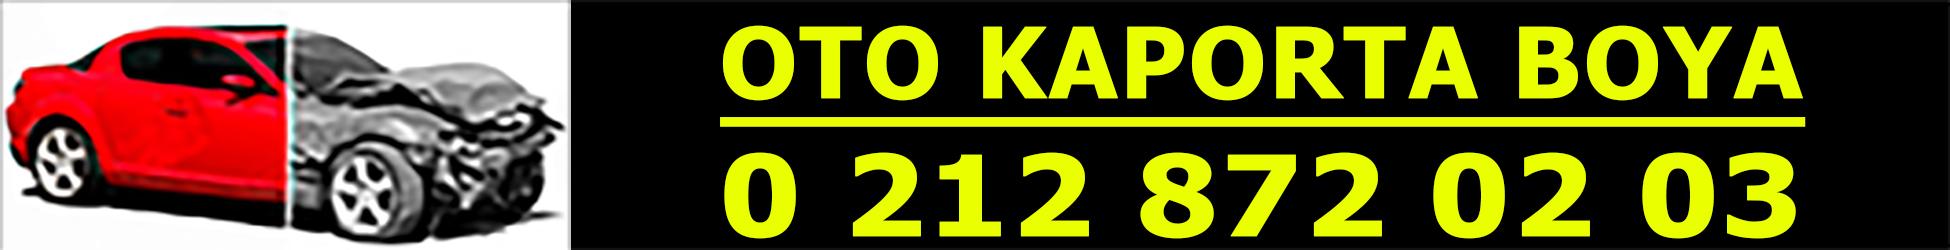 banner292